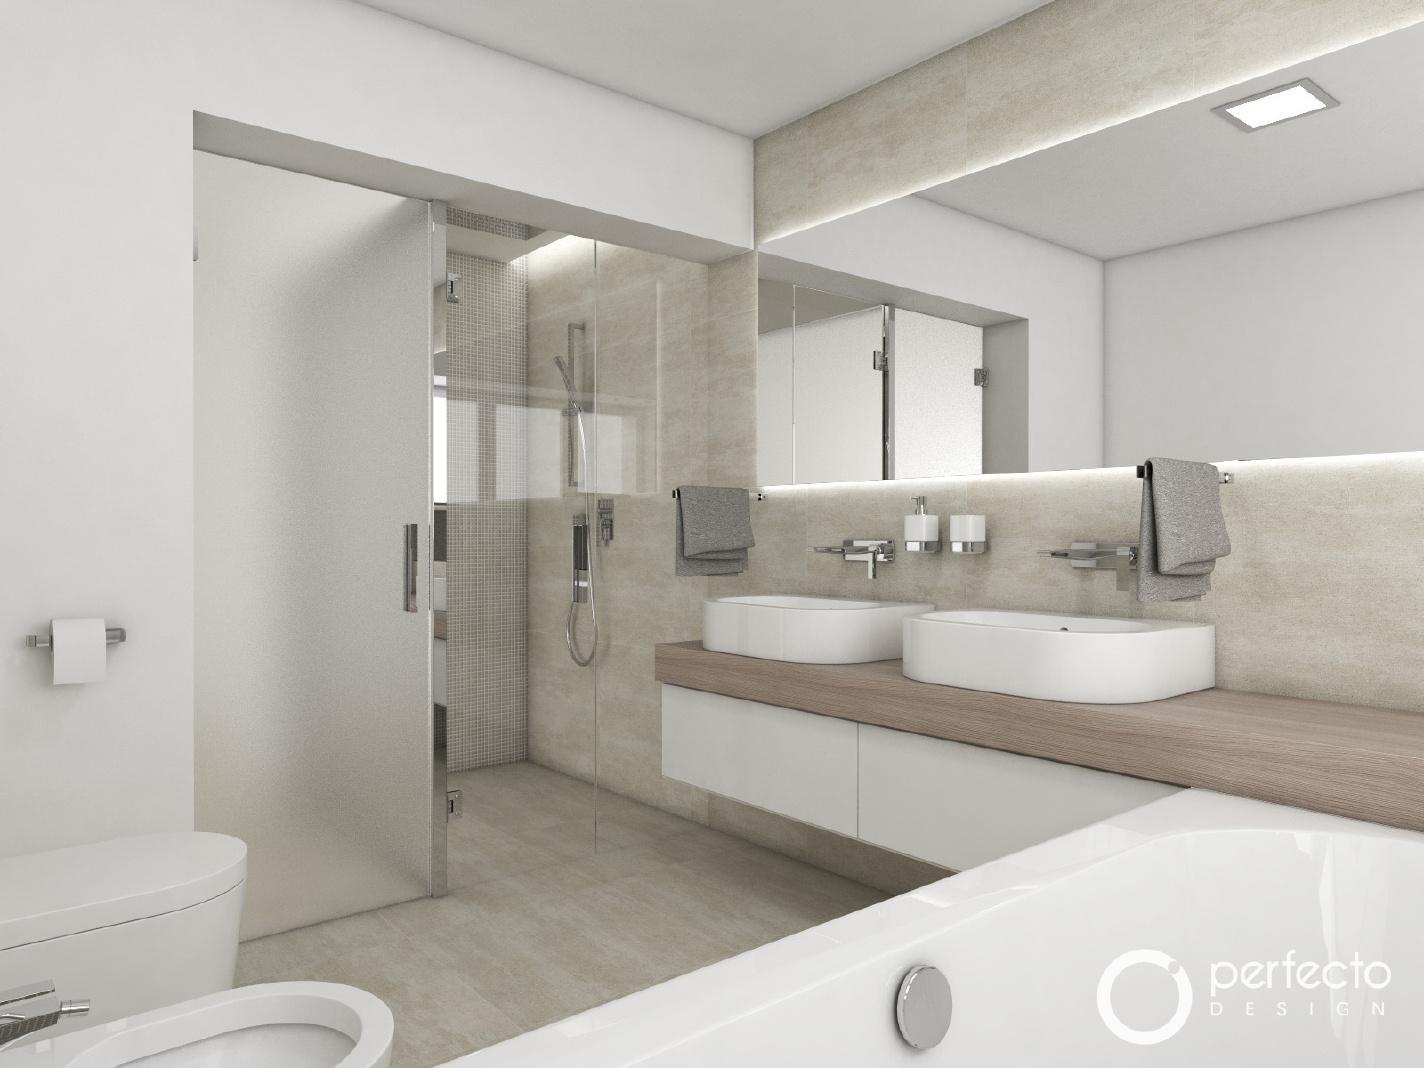 modernes badezimmer imola | perfecto design, Badezimmer